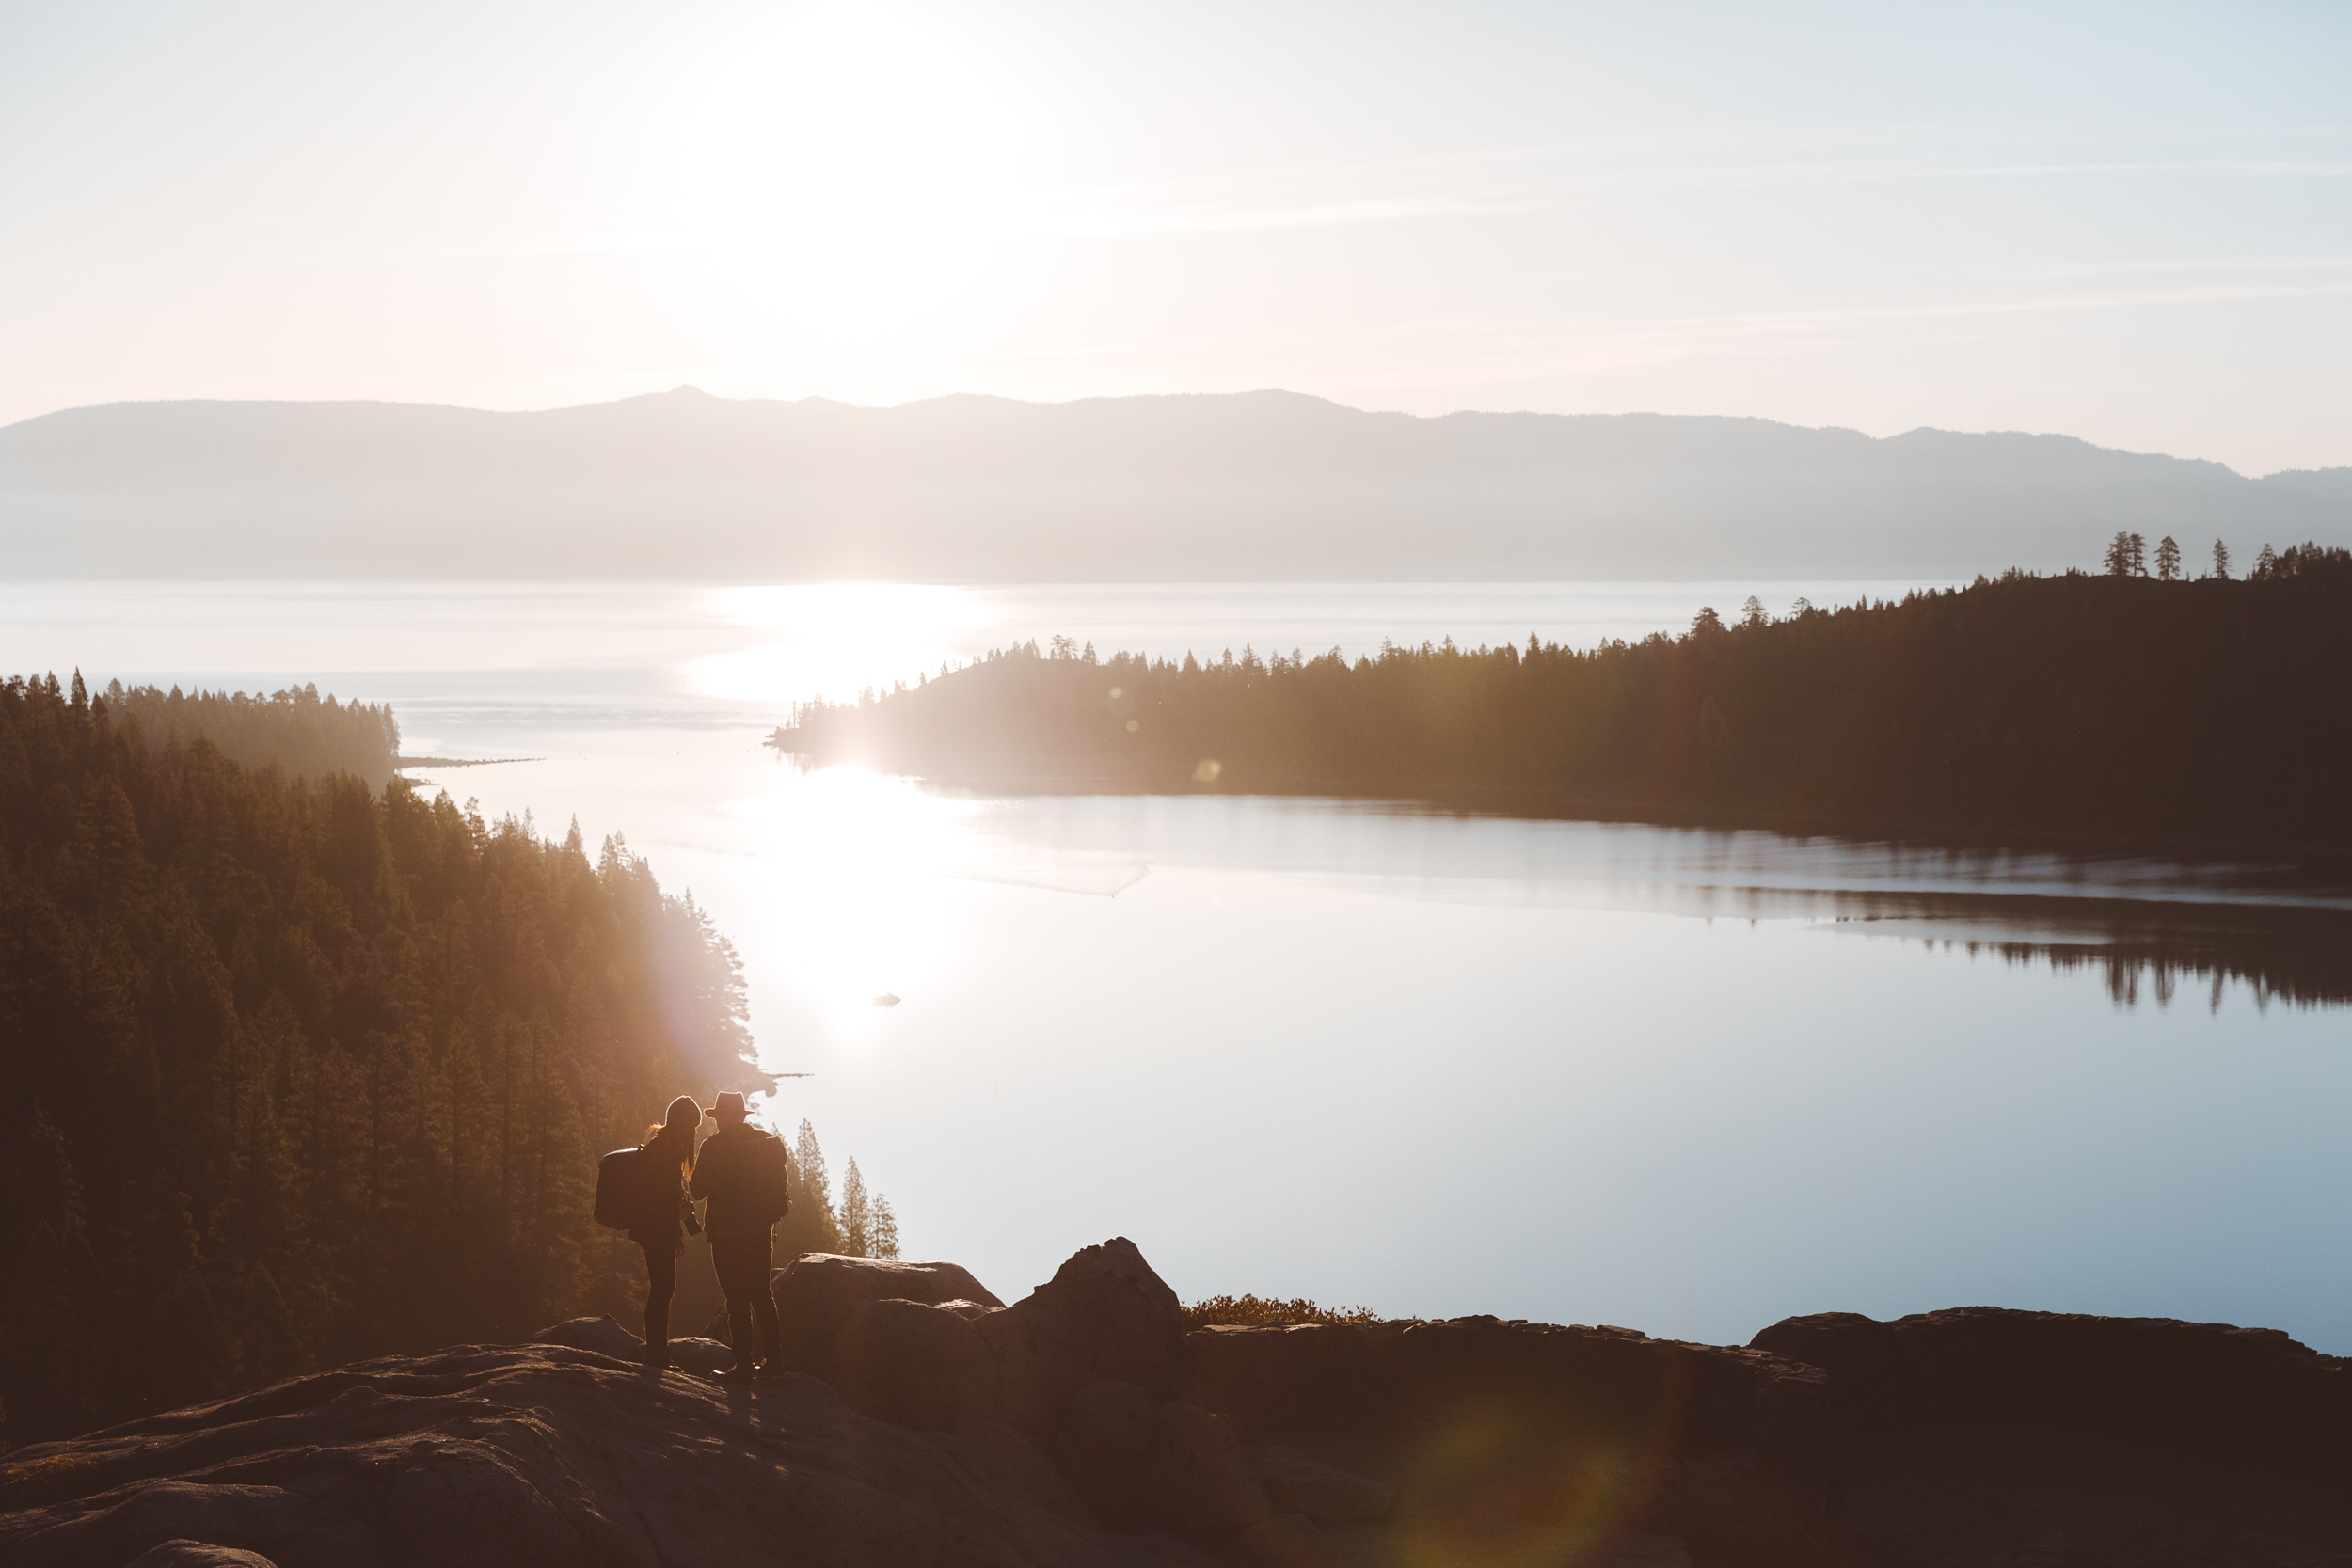 lake-tahoe-emerald-bay-vista-hike-and-shoot-1.jpg